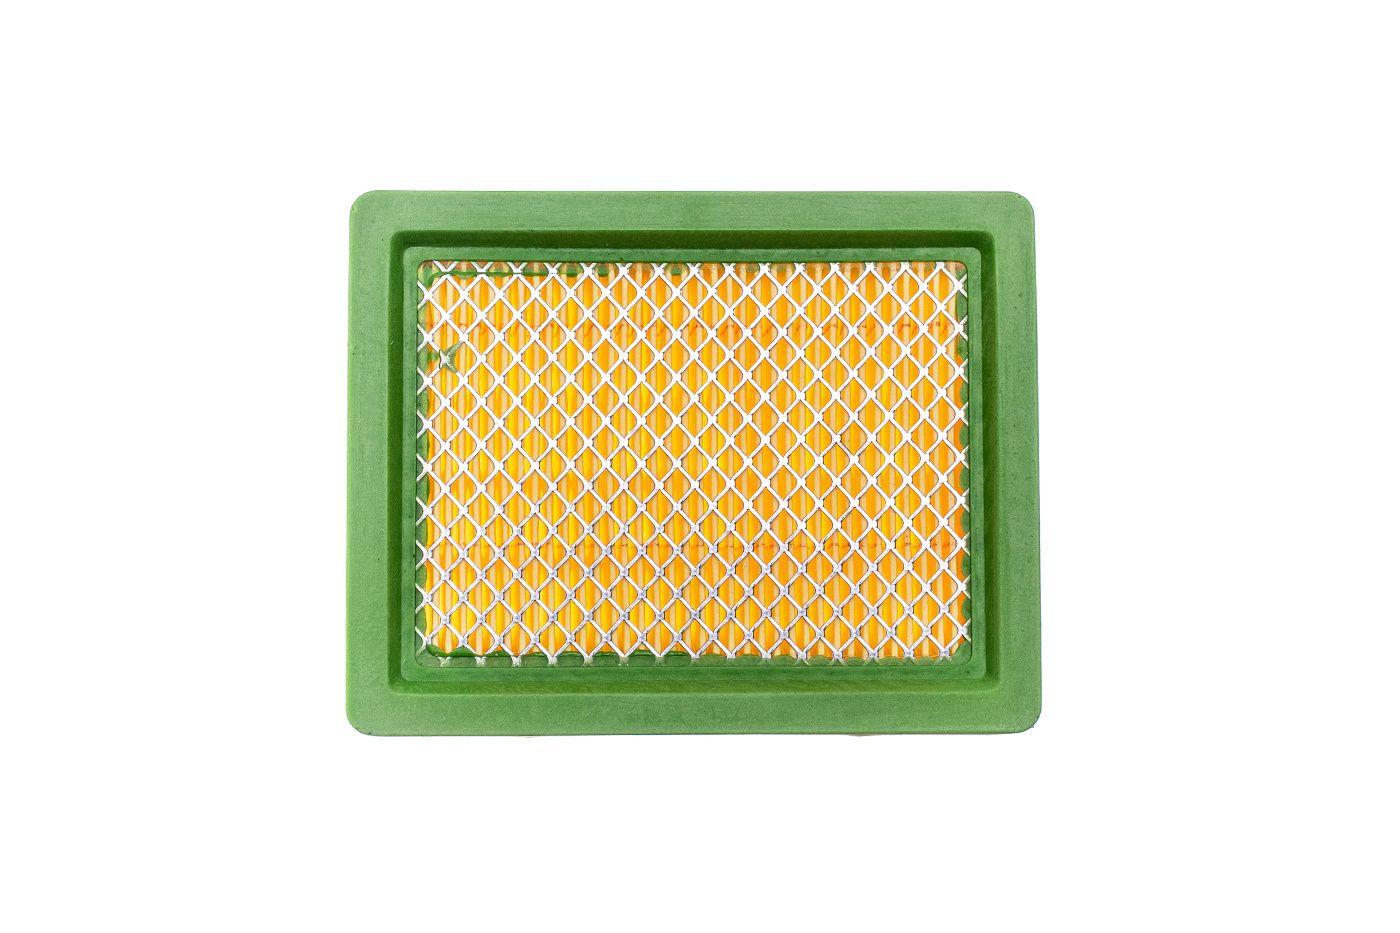 Vzduchový filter DAYE DG600 - GNDG600-117